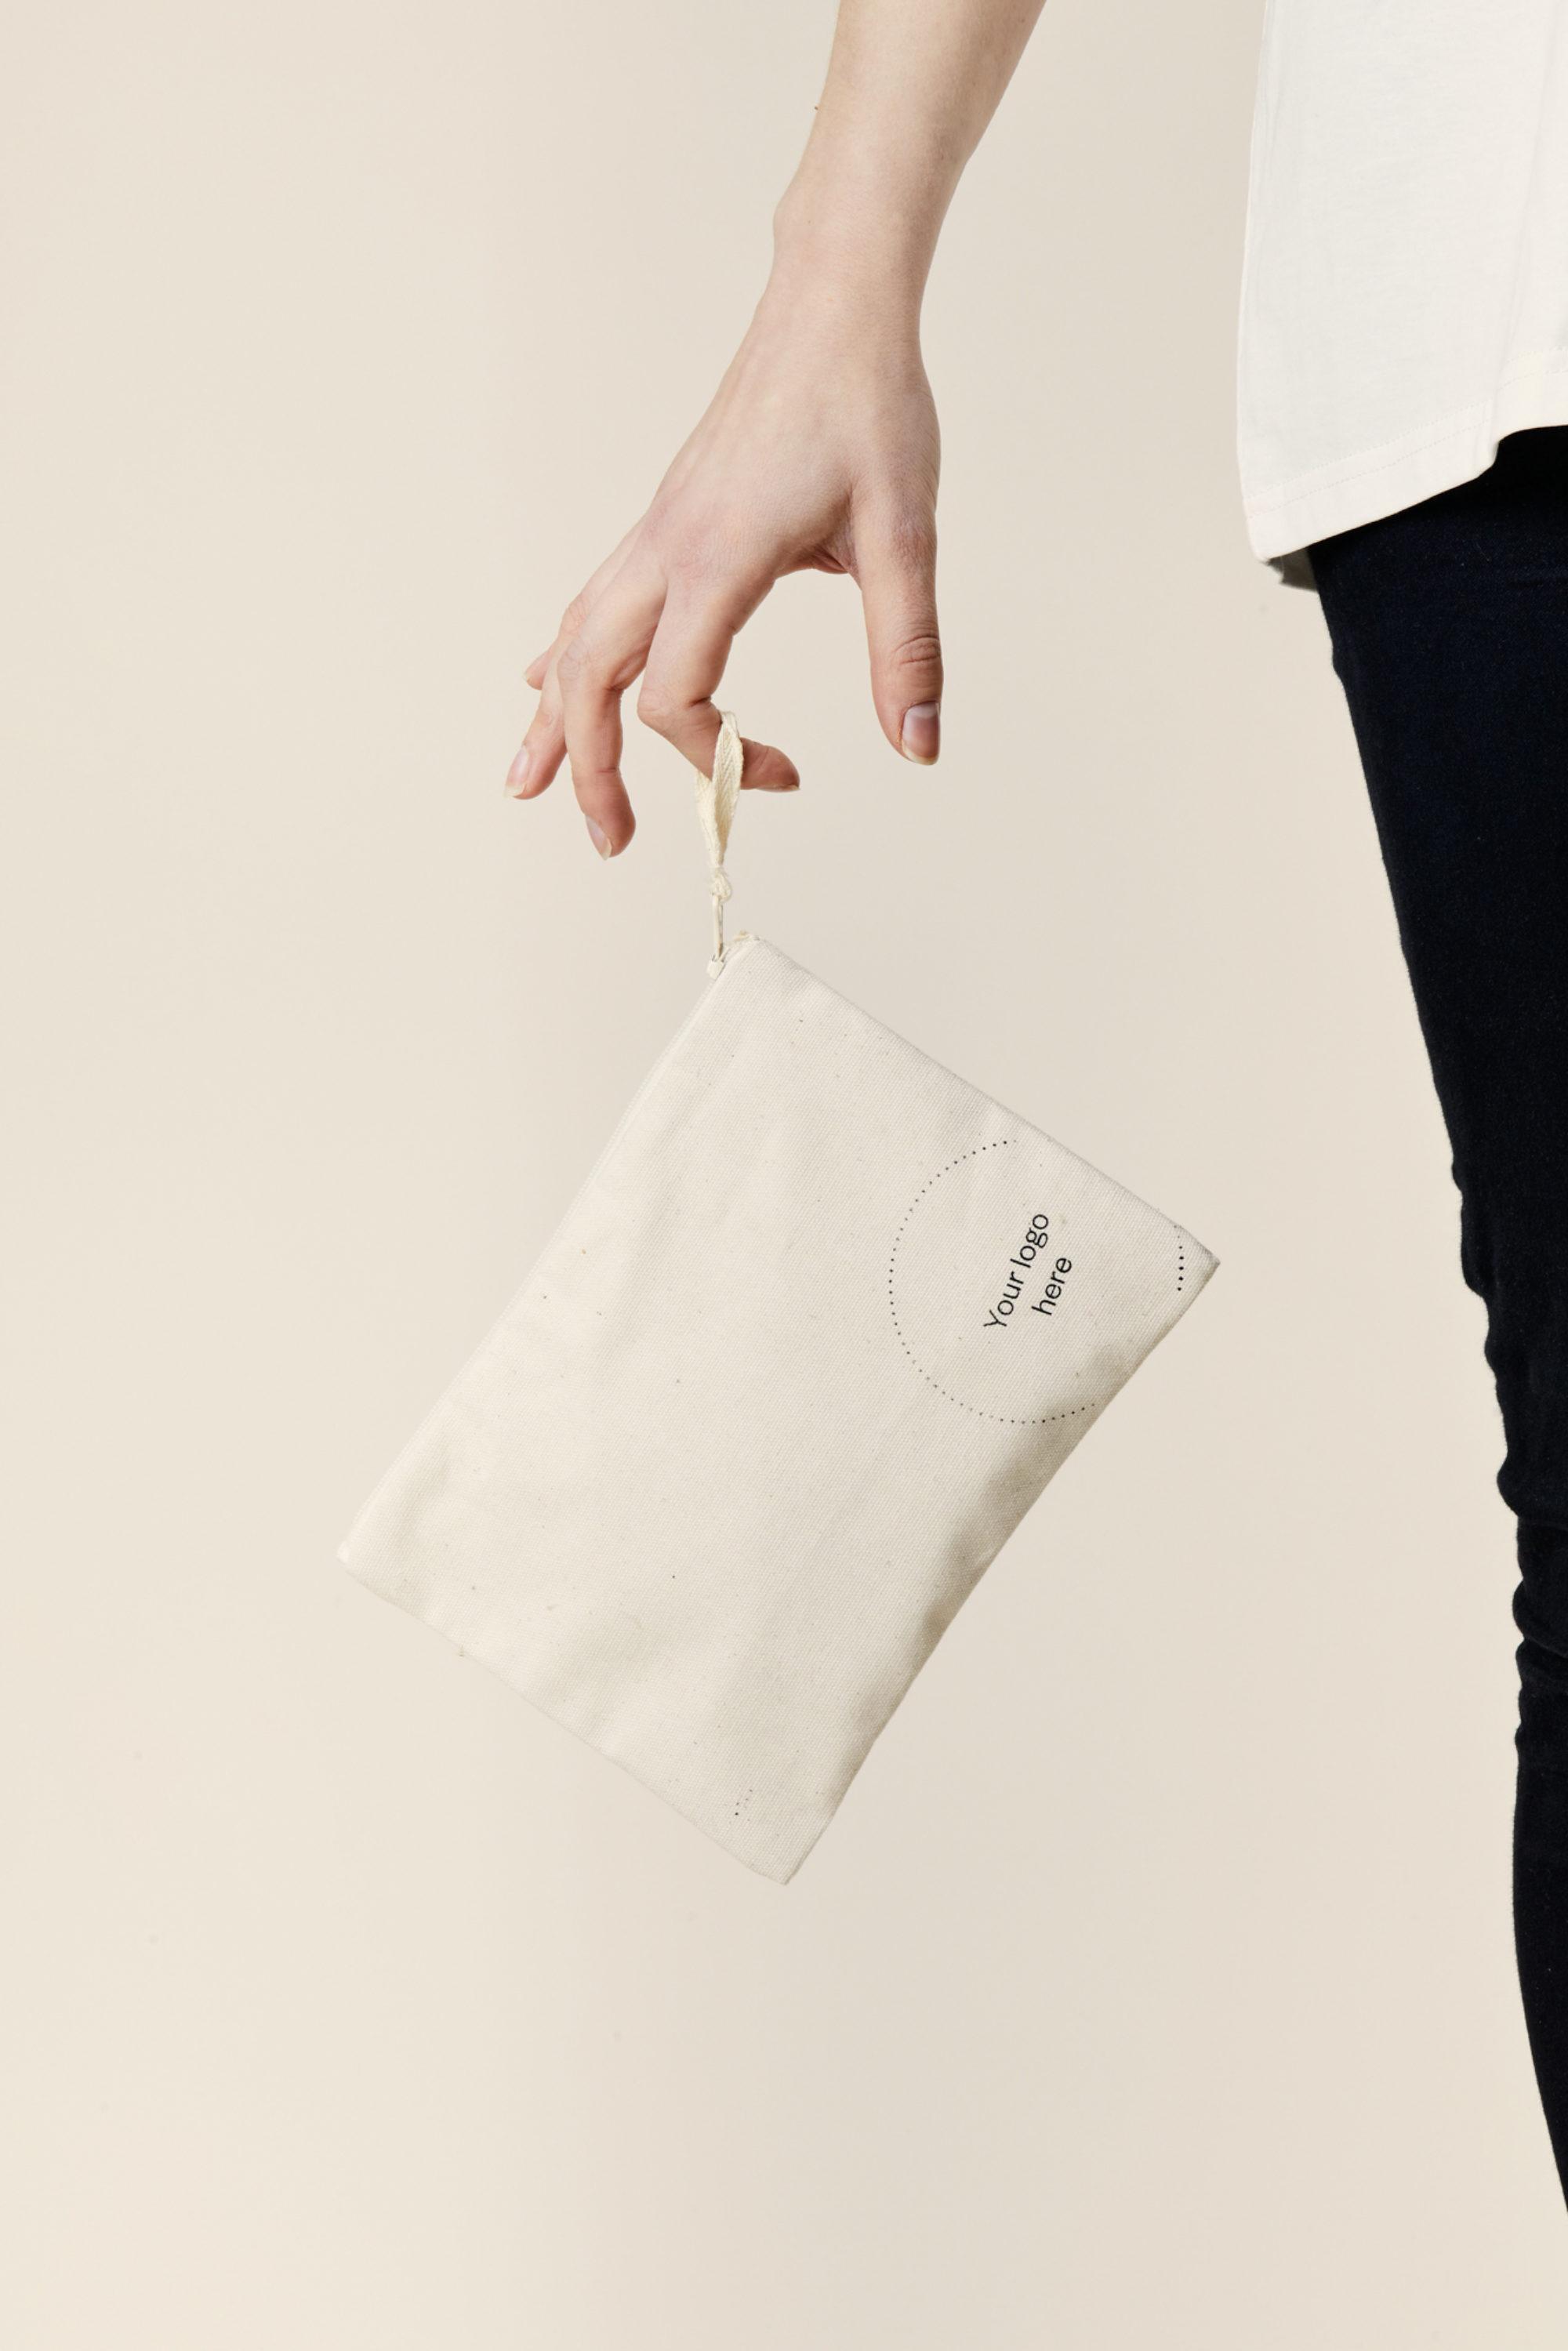 Merchery white pencil case branded promotional item